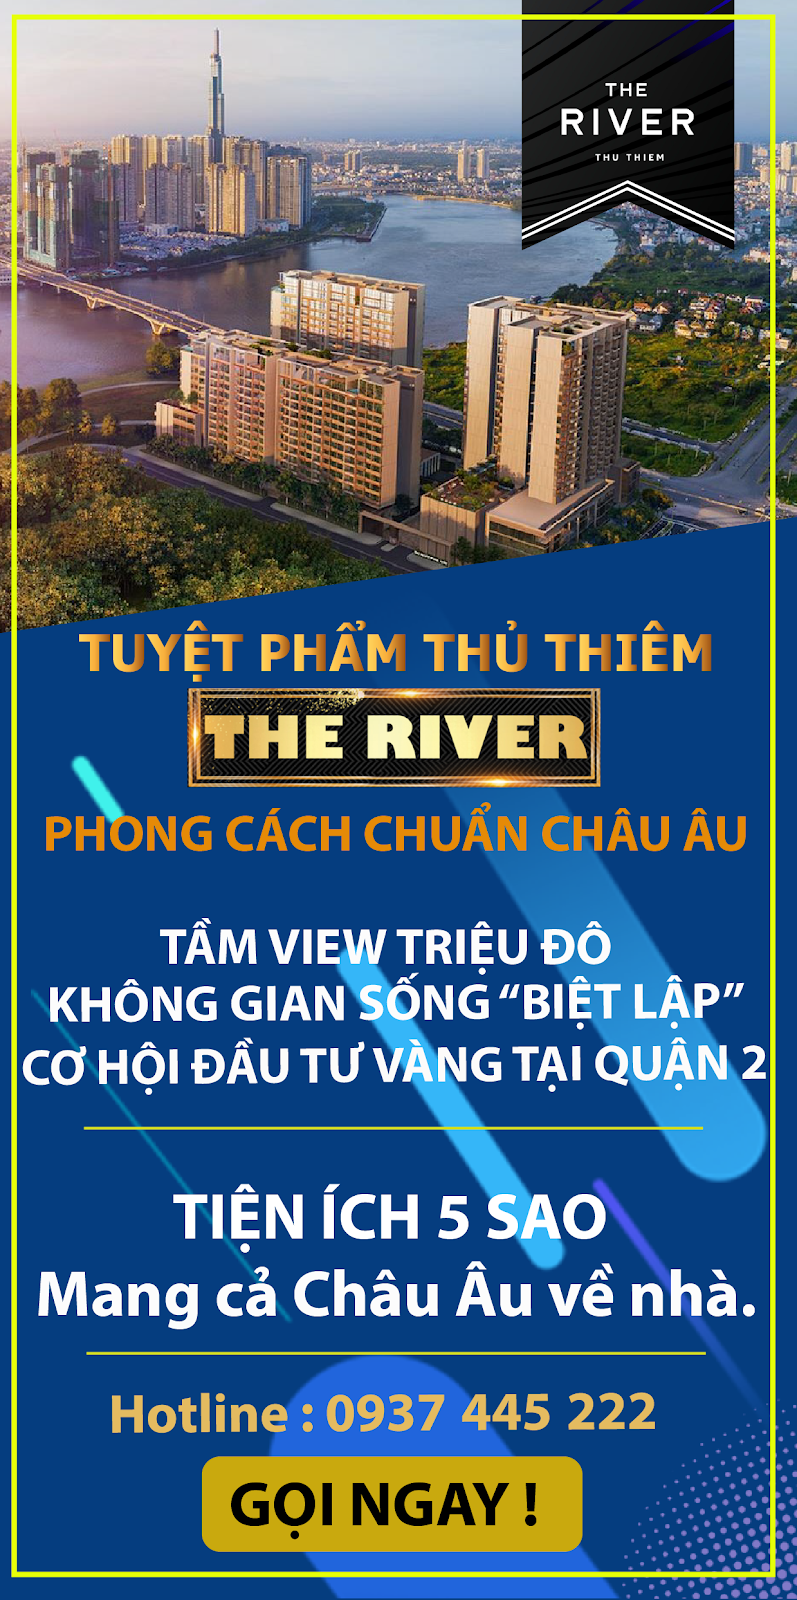 Căn hộ Scenia Bay Nha Trang, Scenia bay, scenia bay nha trang